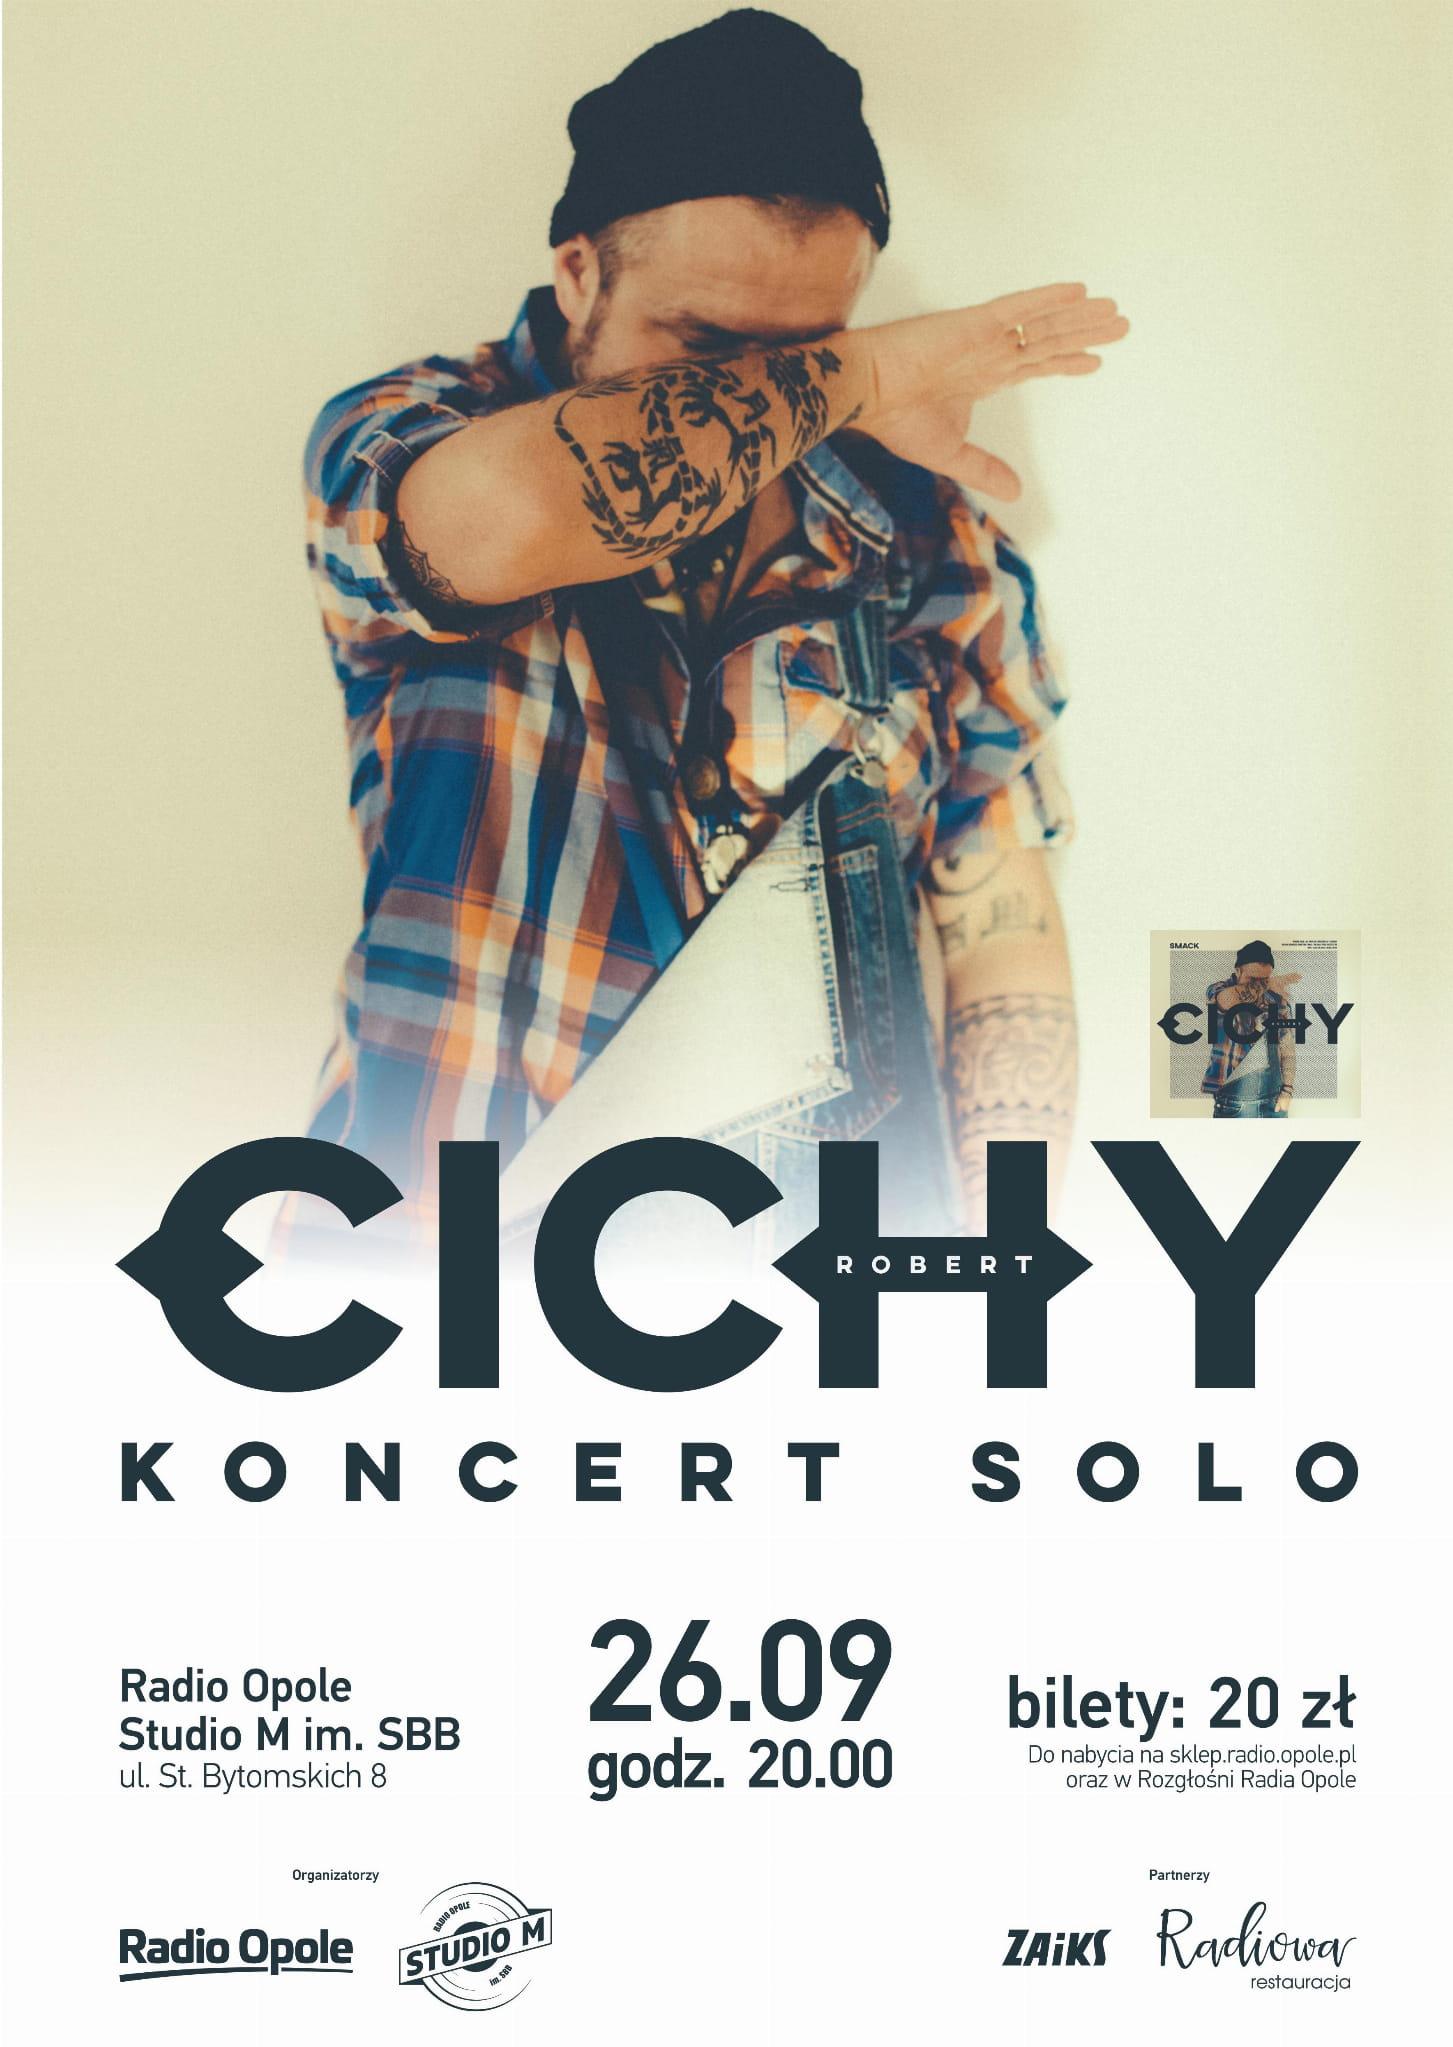 Robert Cichy z koncertem w Studiu M im. SBB!